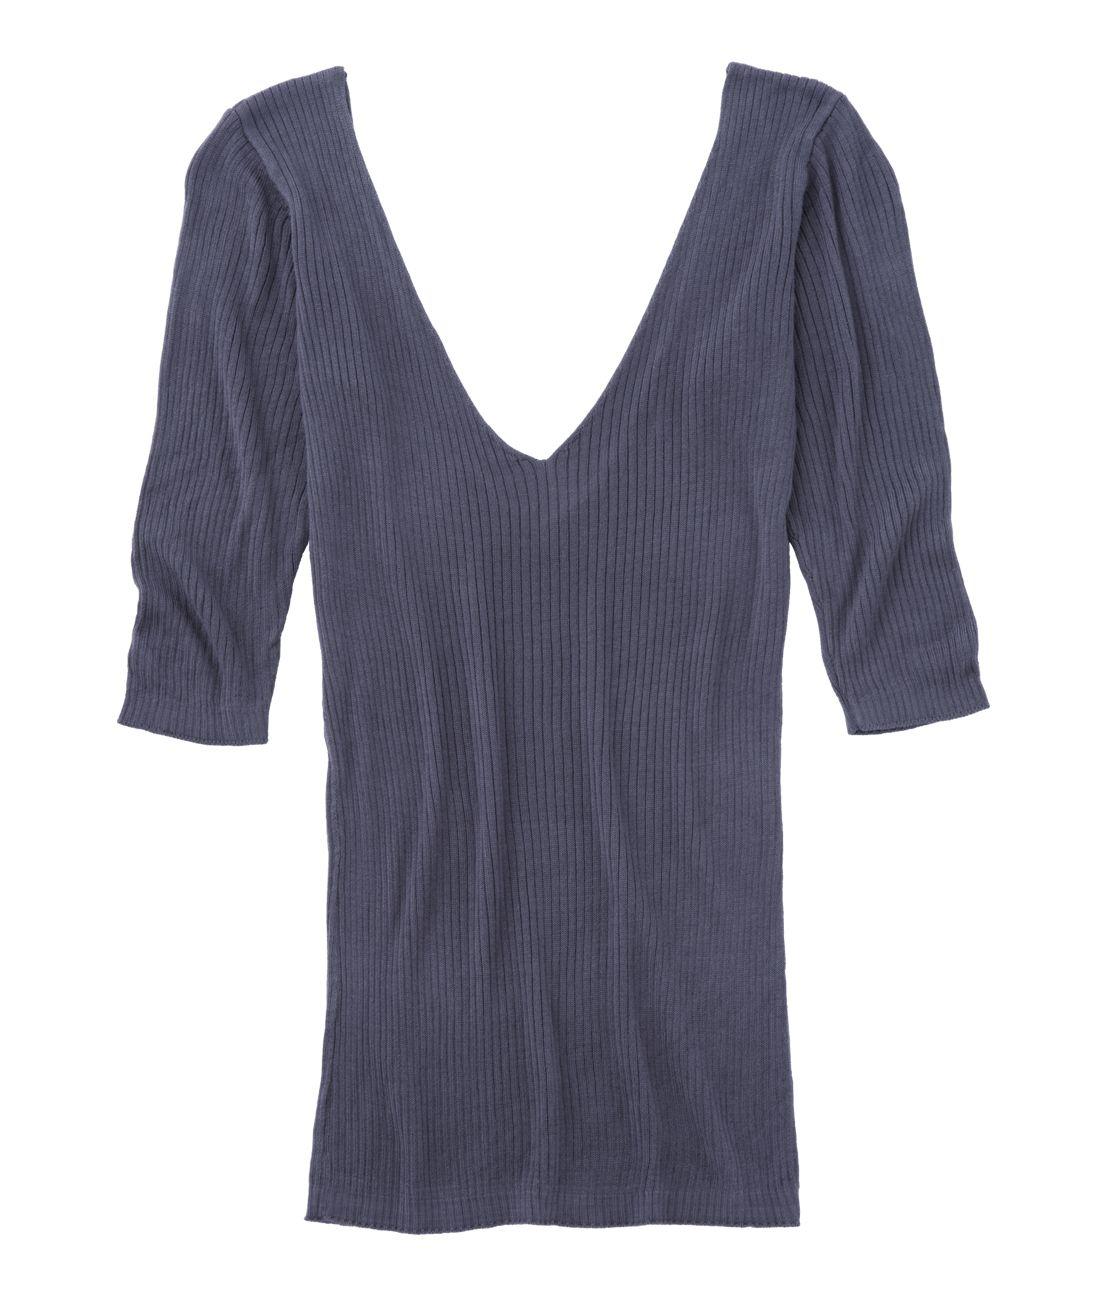 V-neck 5 minutes sleeve knit